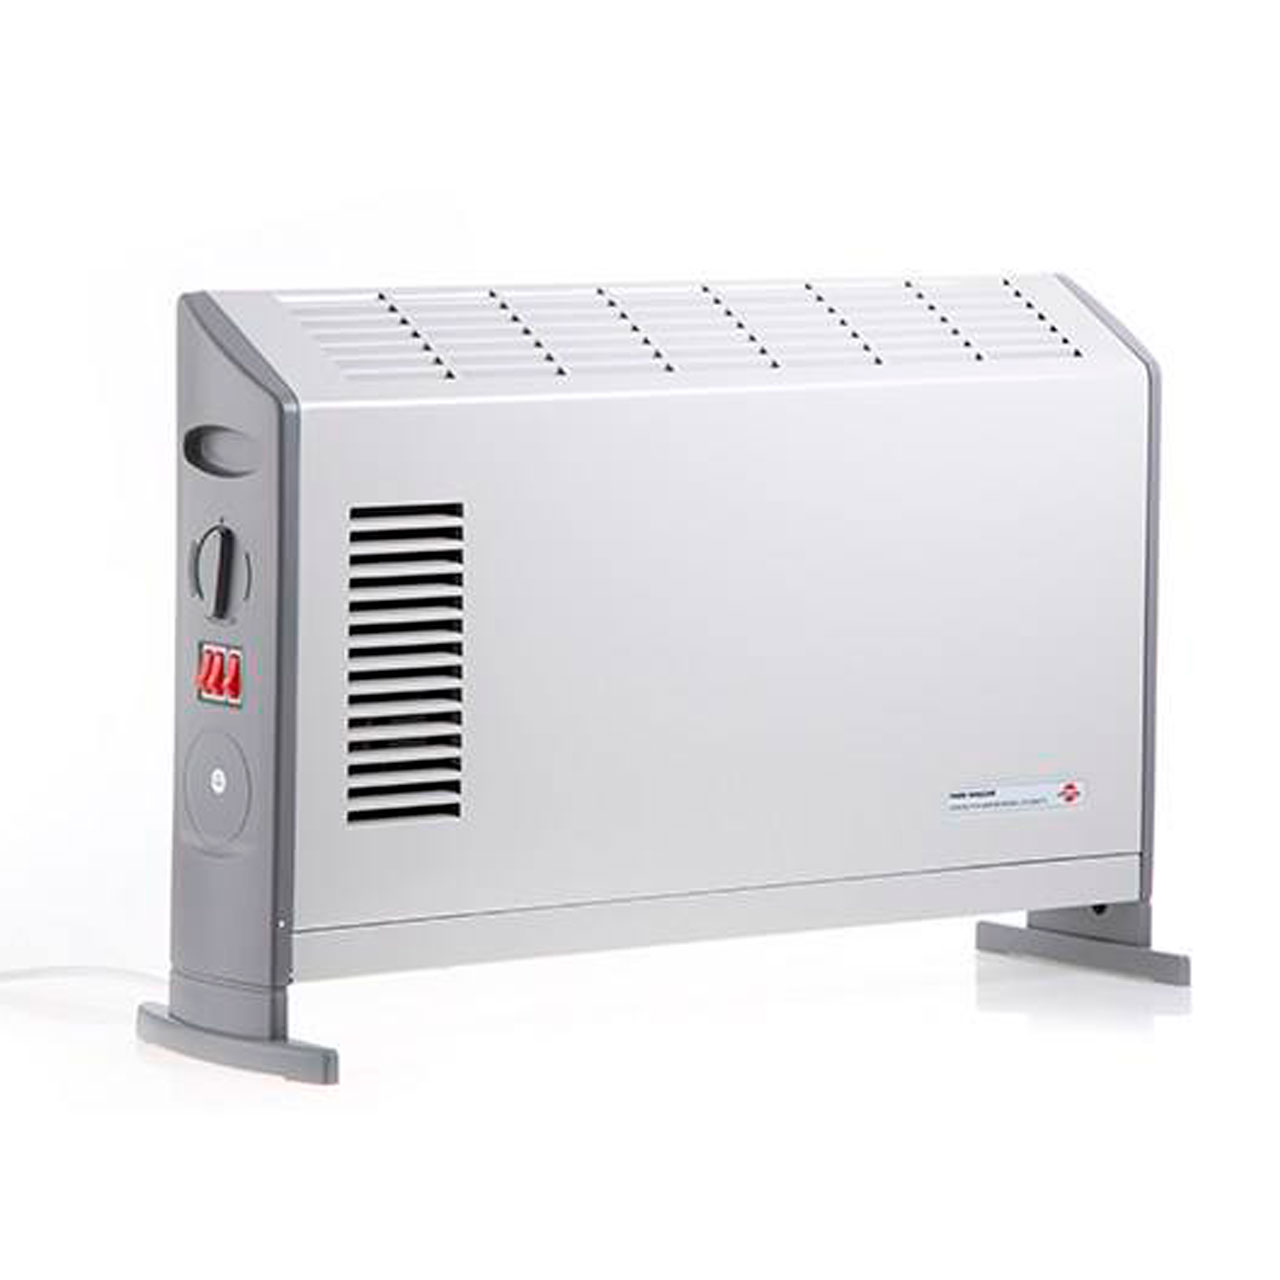 تصویر بخاری کانوکتور پارس خزر مدل CH2000TM Pars Khazar CH2000TM Heater